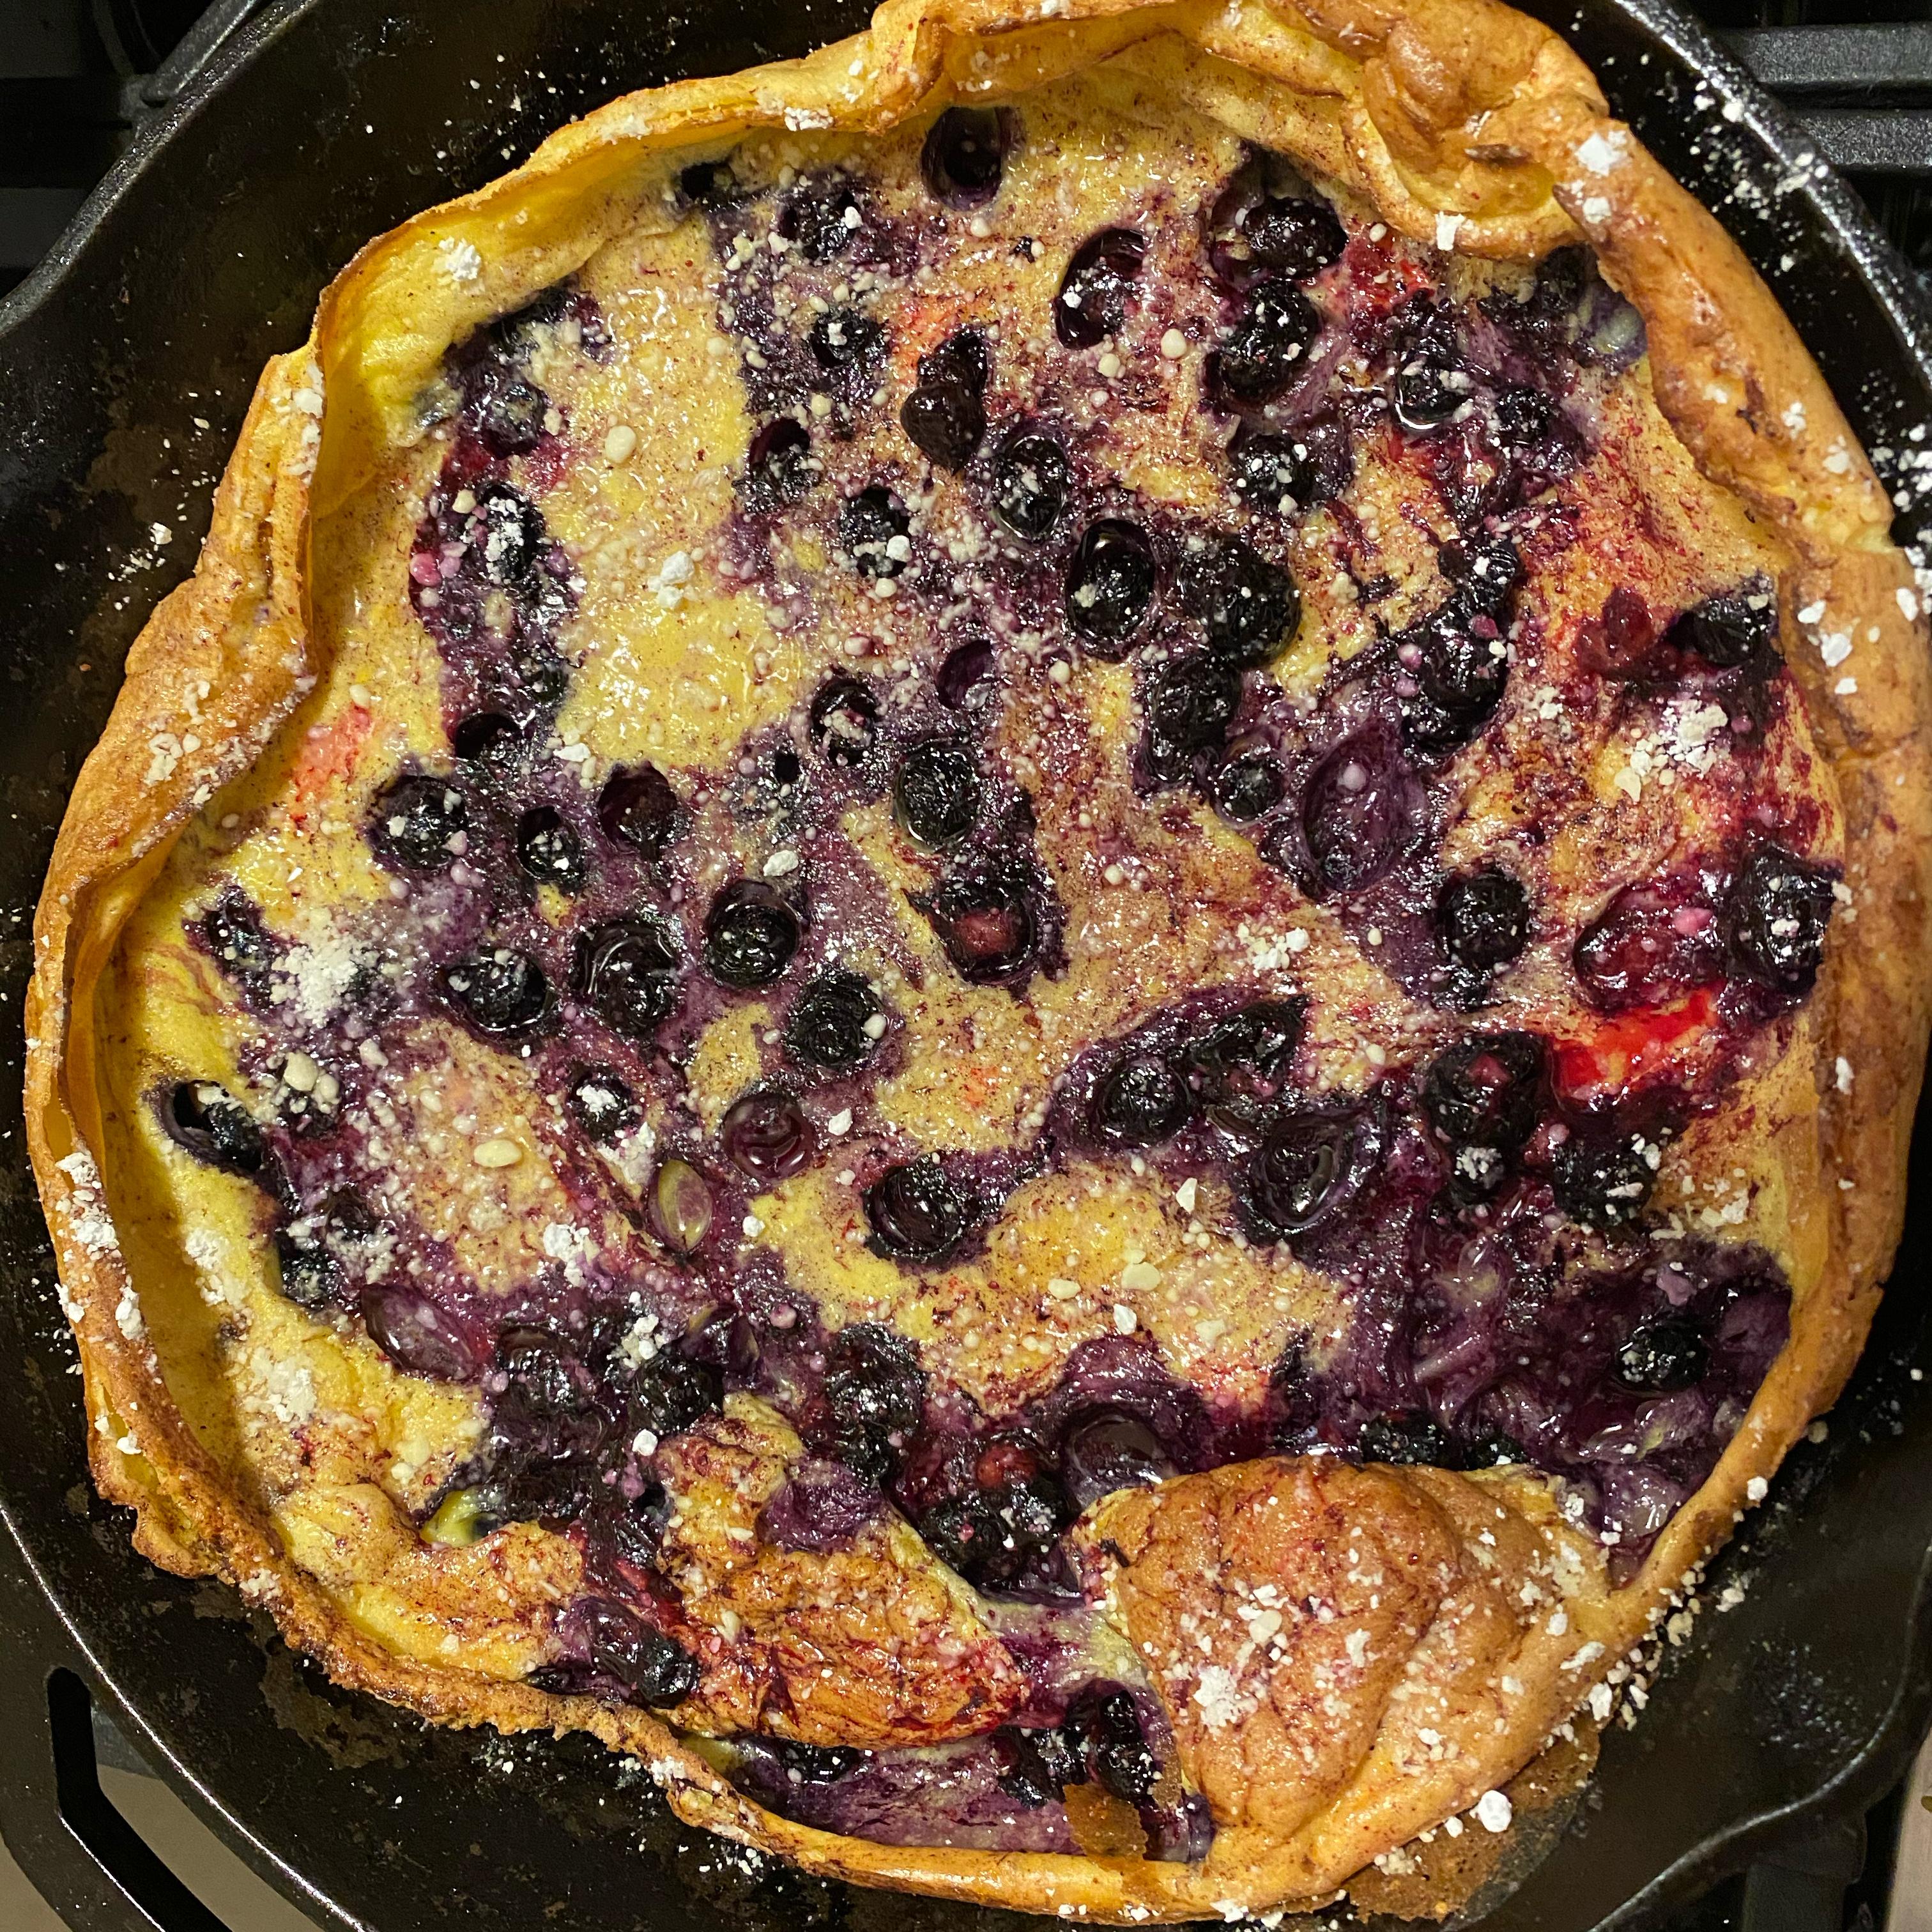 Chef John's Blueberry Dutch Baby